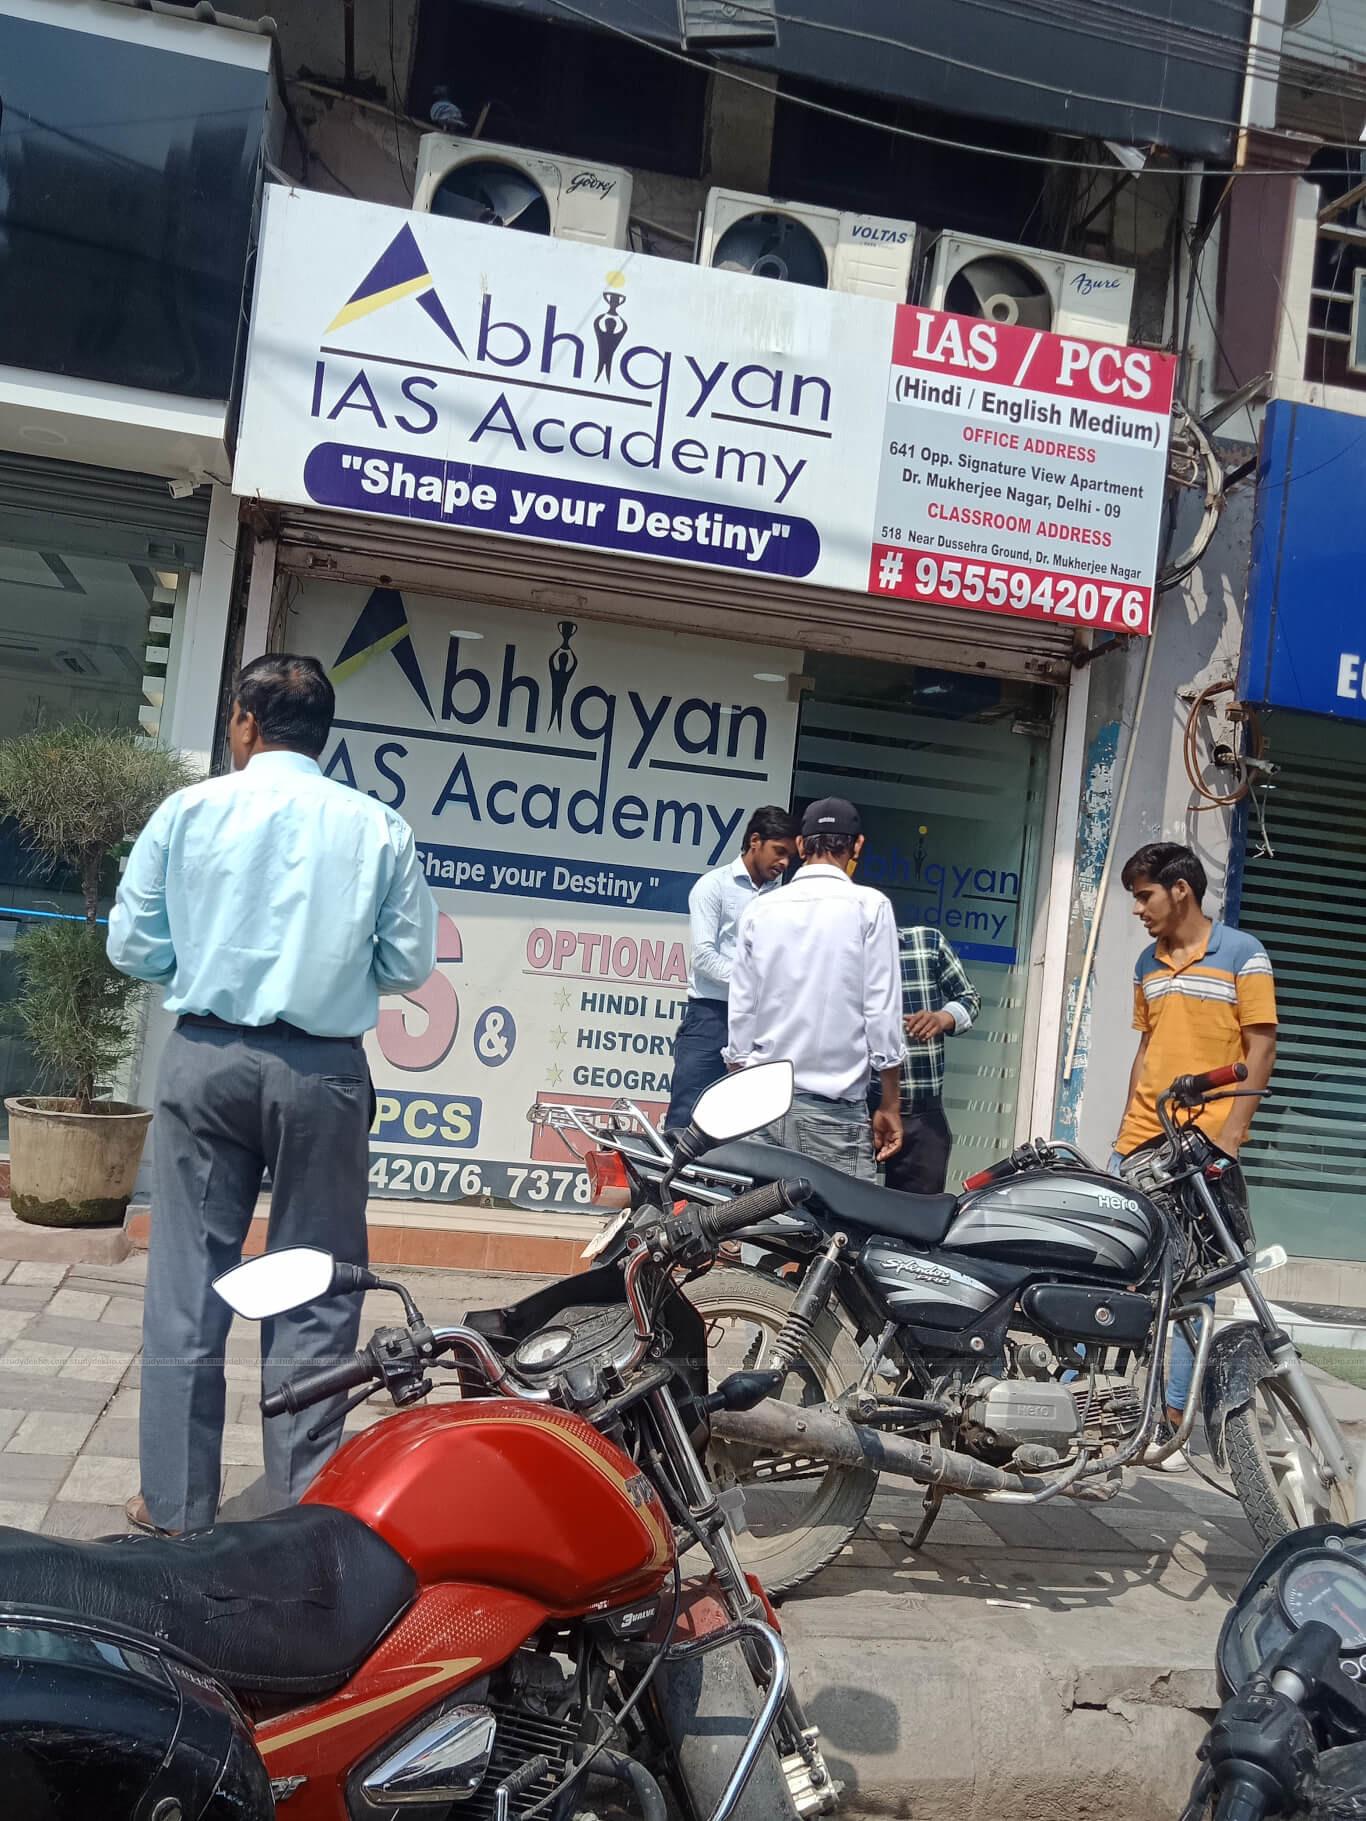 ABHIGYAN IAS ACADEMY Gallery